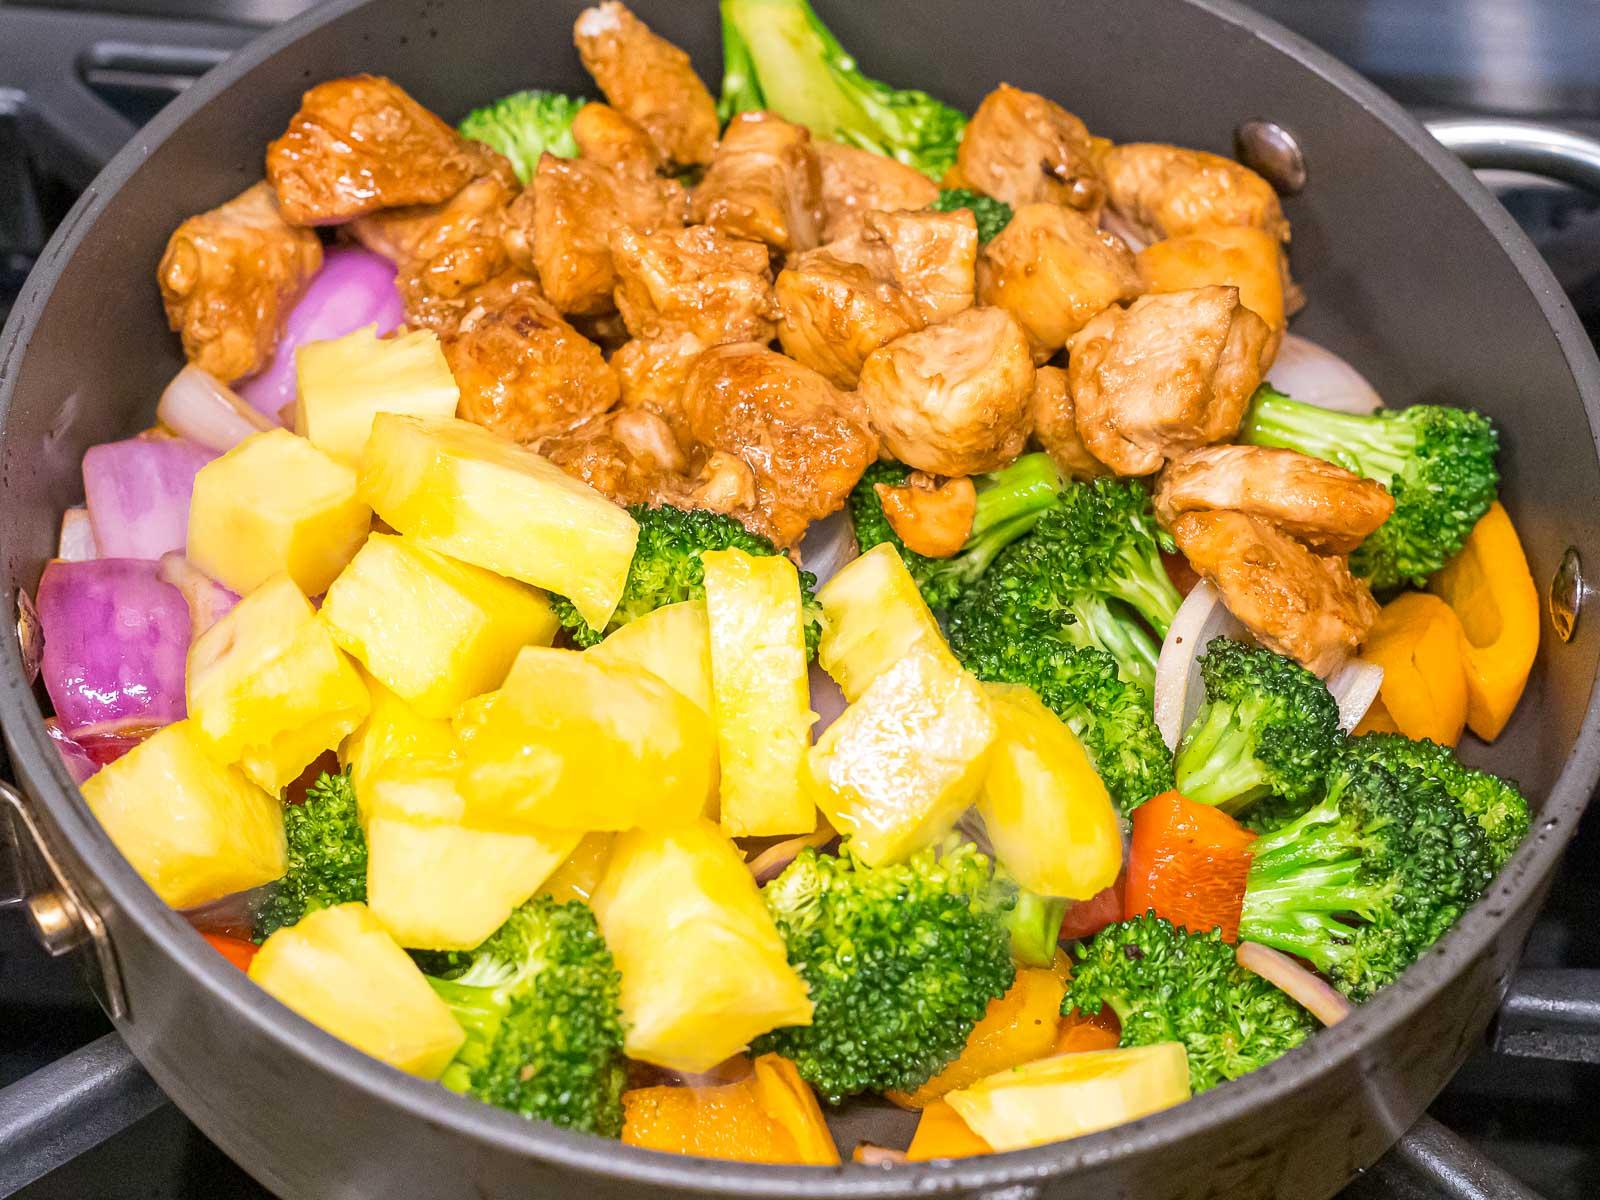 Hawaiian pineapple chunks, chicken, and veggies stir fried together in a pan